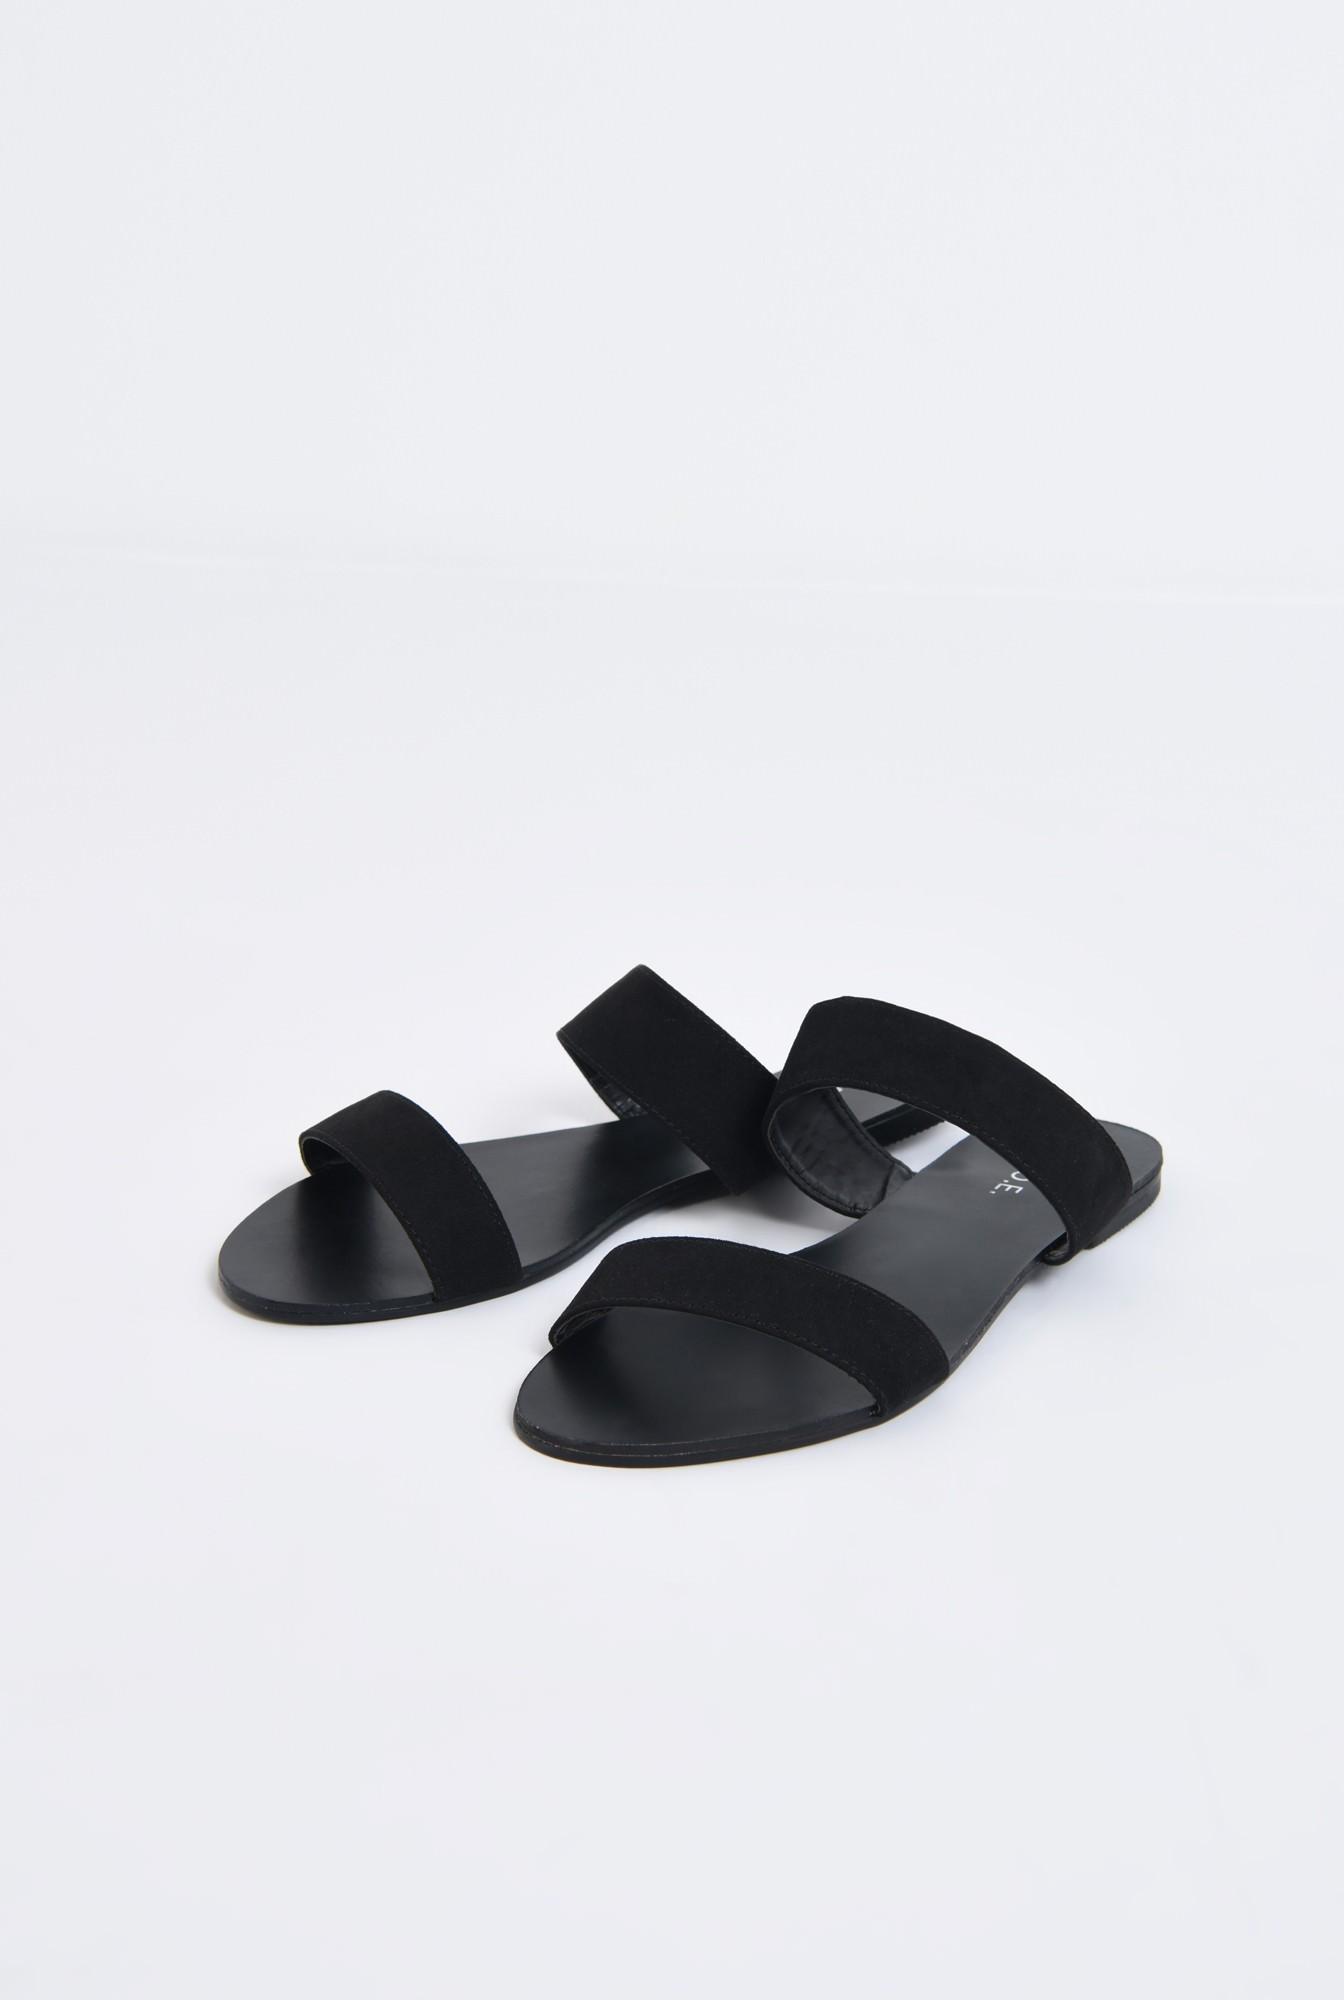 1 - papuci din velur, negru, talpa joasa, barete late